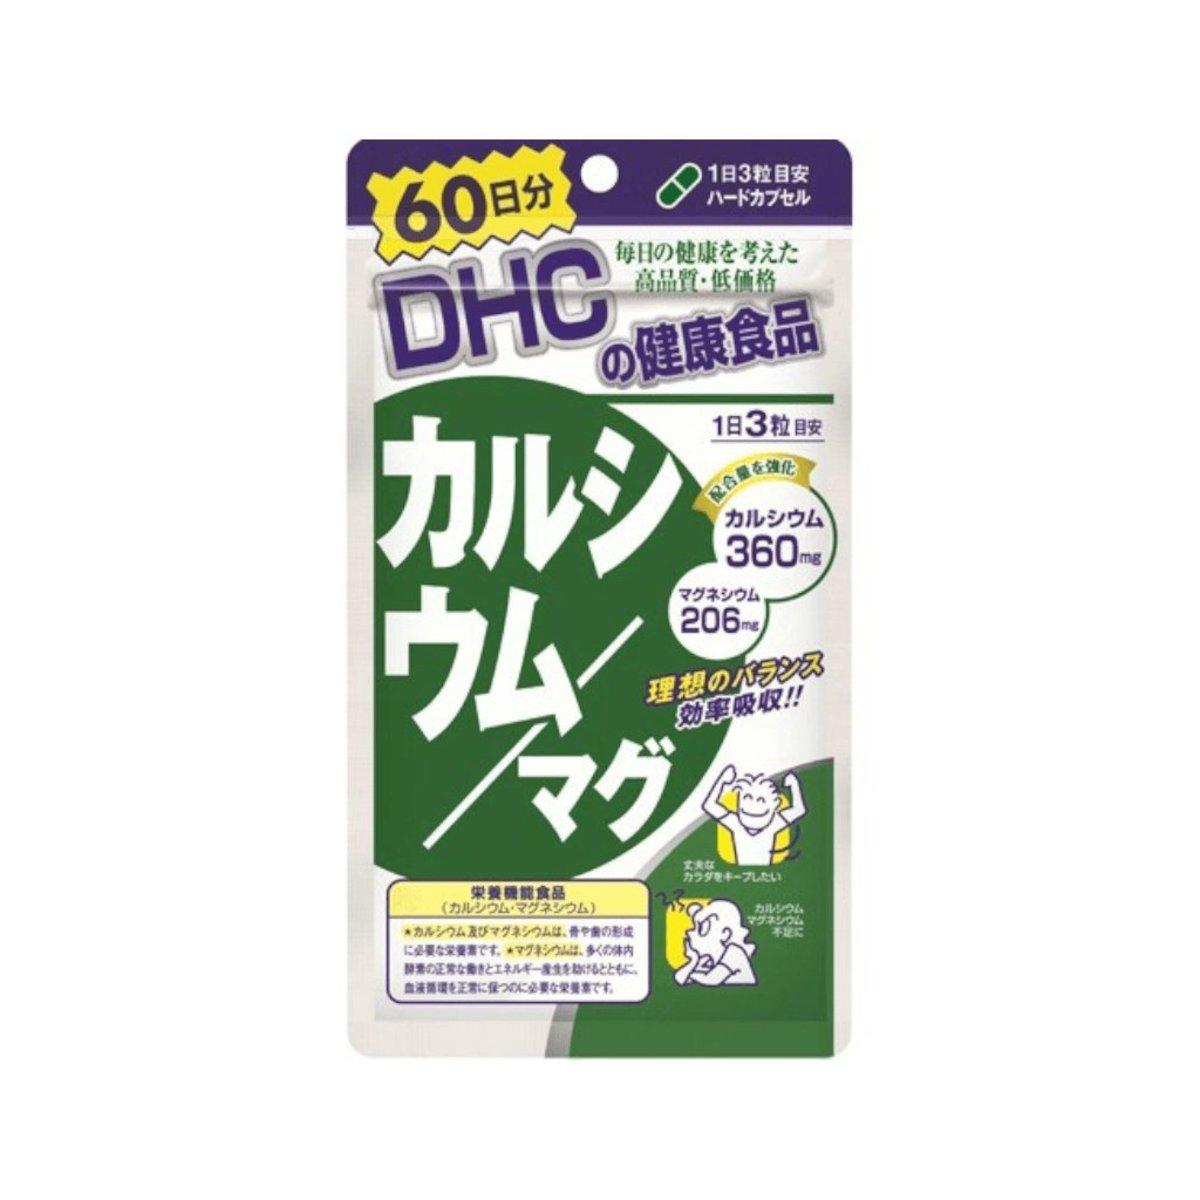 DHC 補充鈣質保健品 60日180P 122.5G